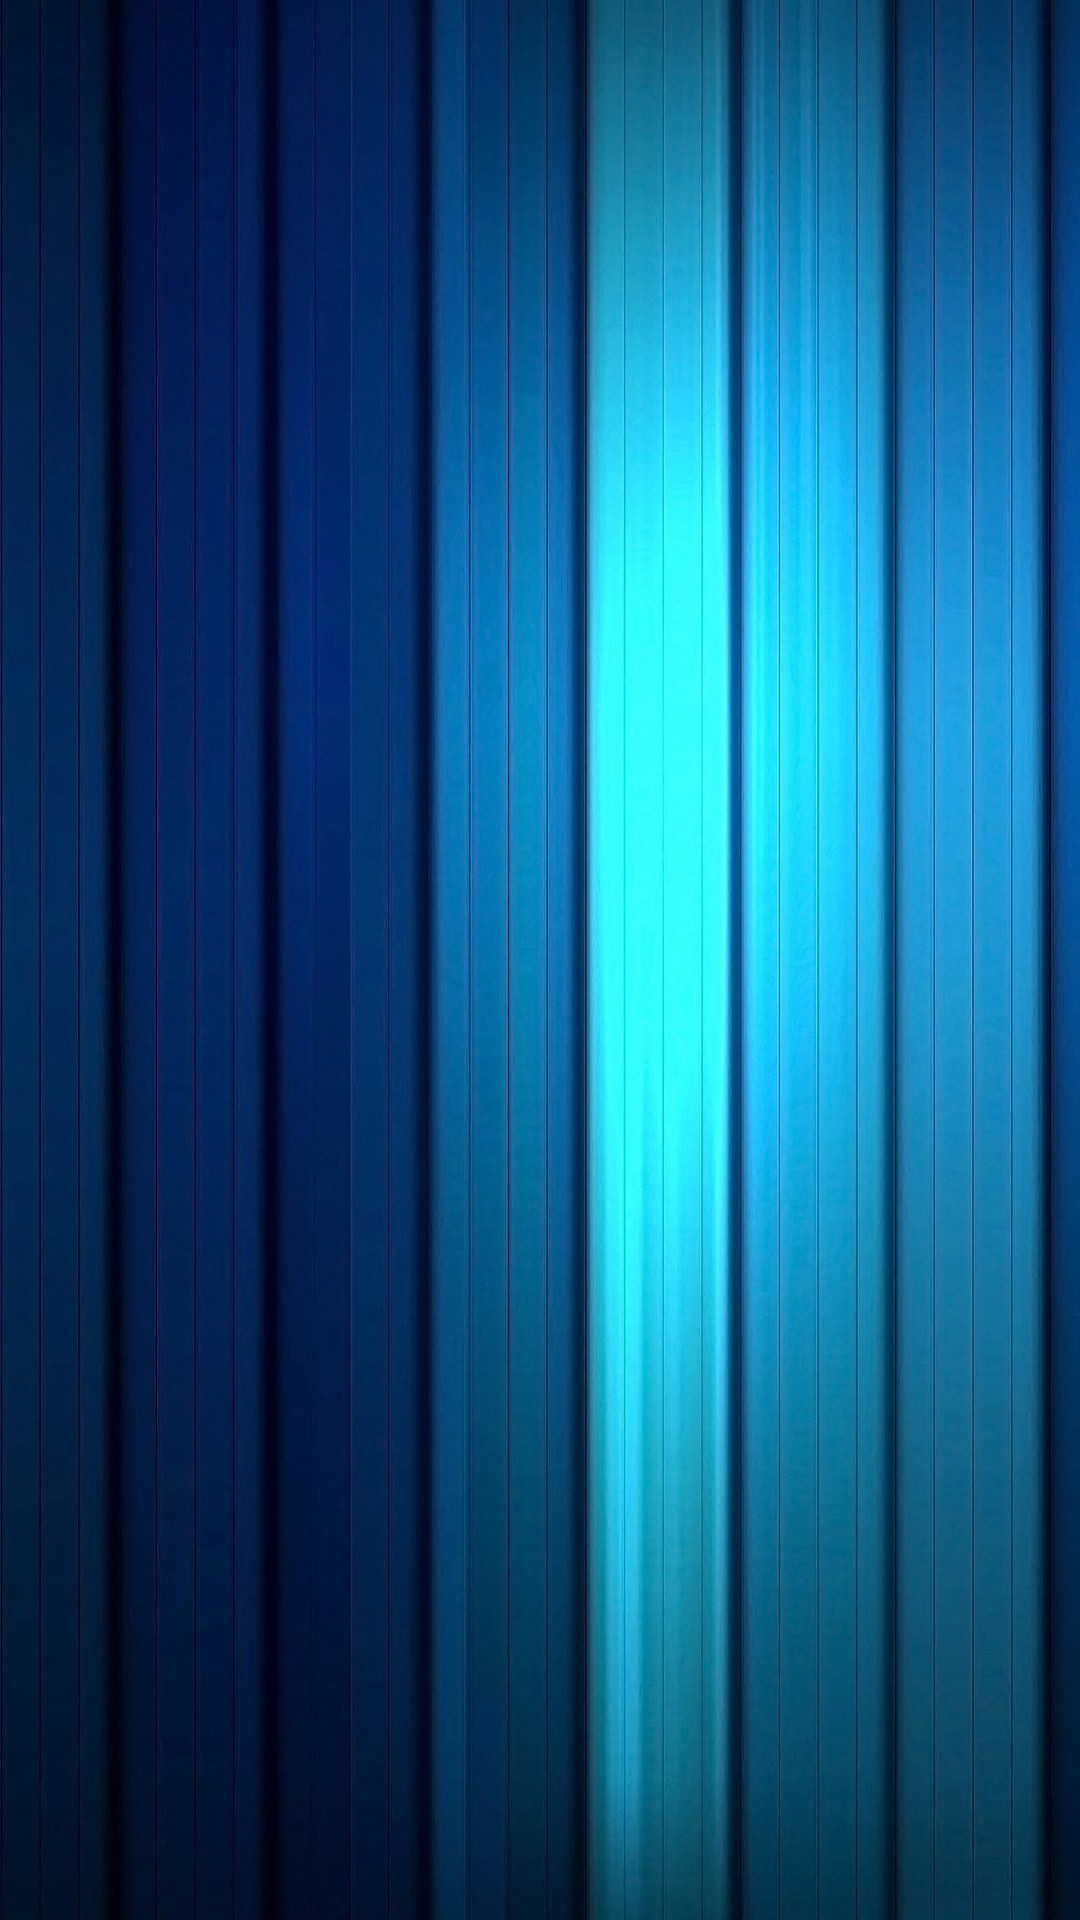 Blue Lines iPhone 6 wallpaper